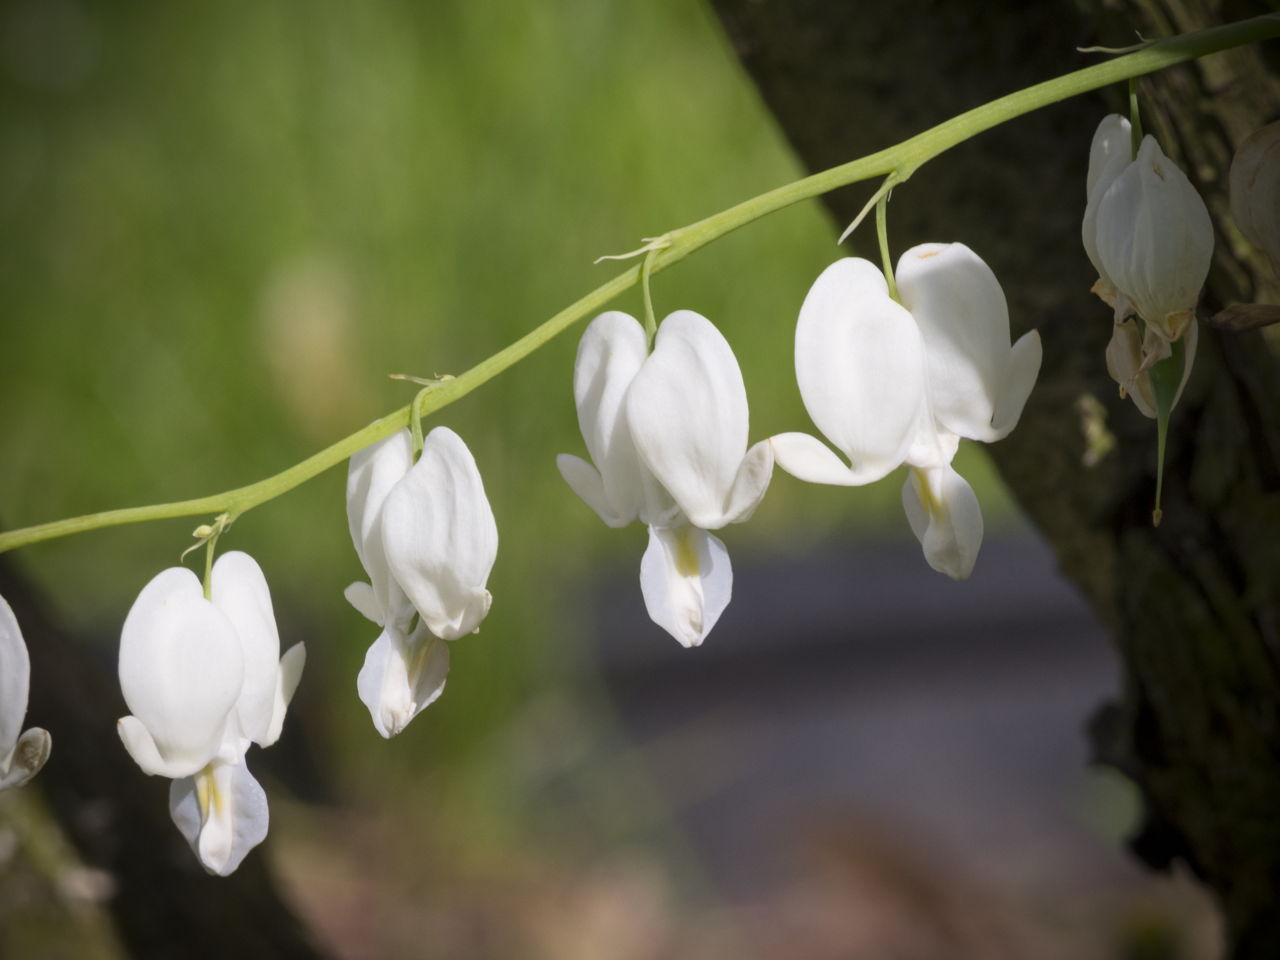 Bleeding Heart Flower In Bloom